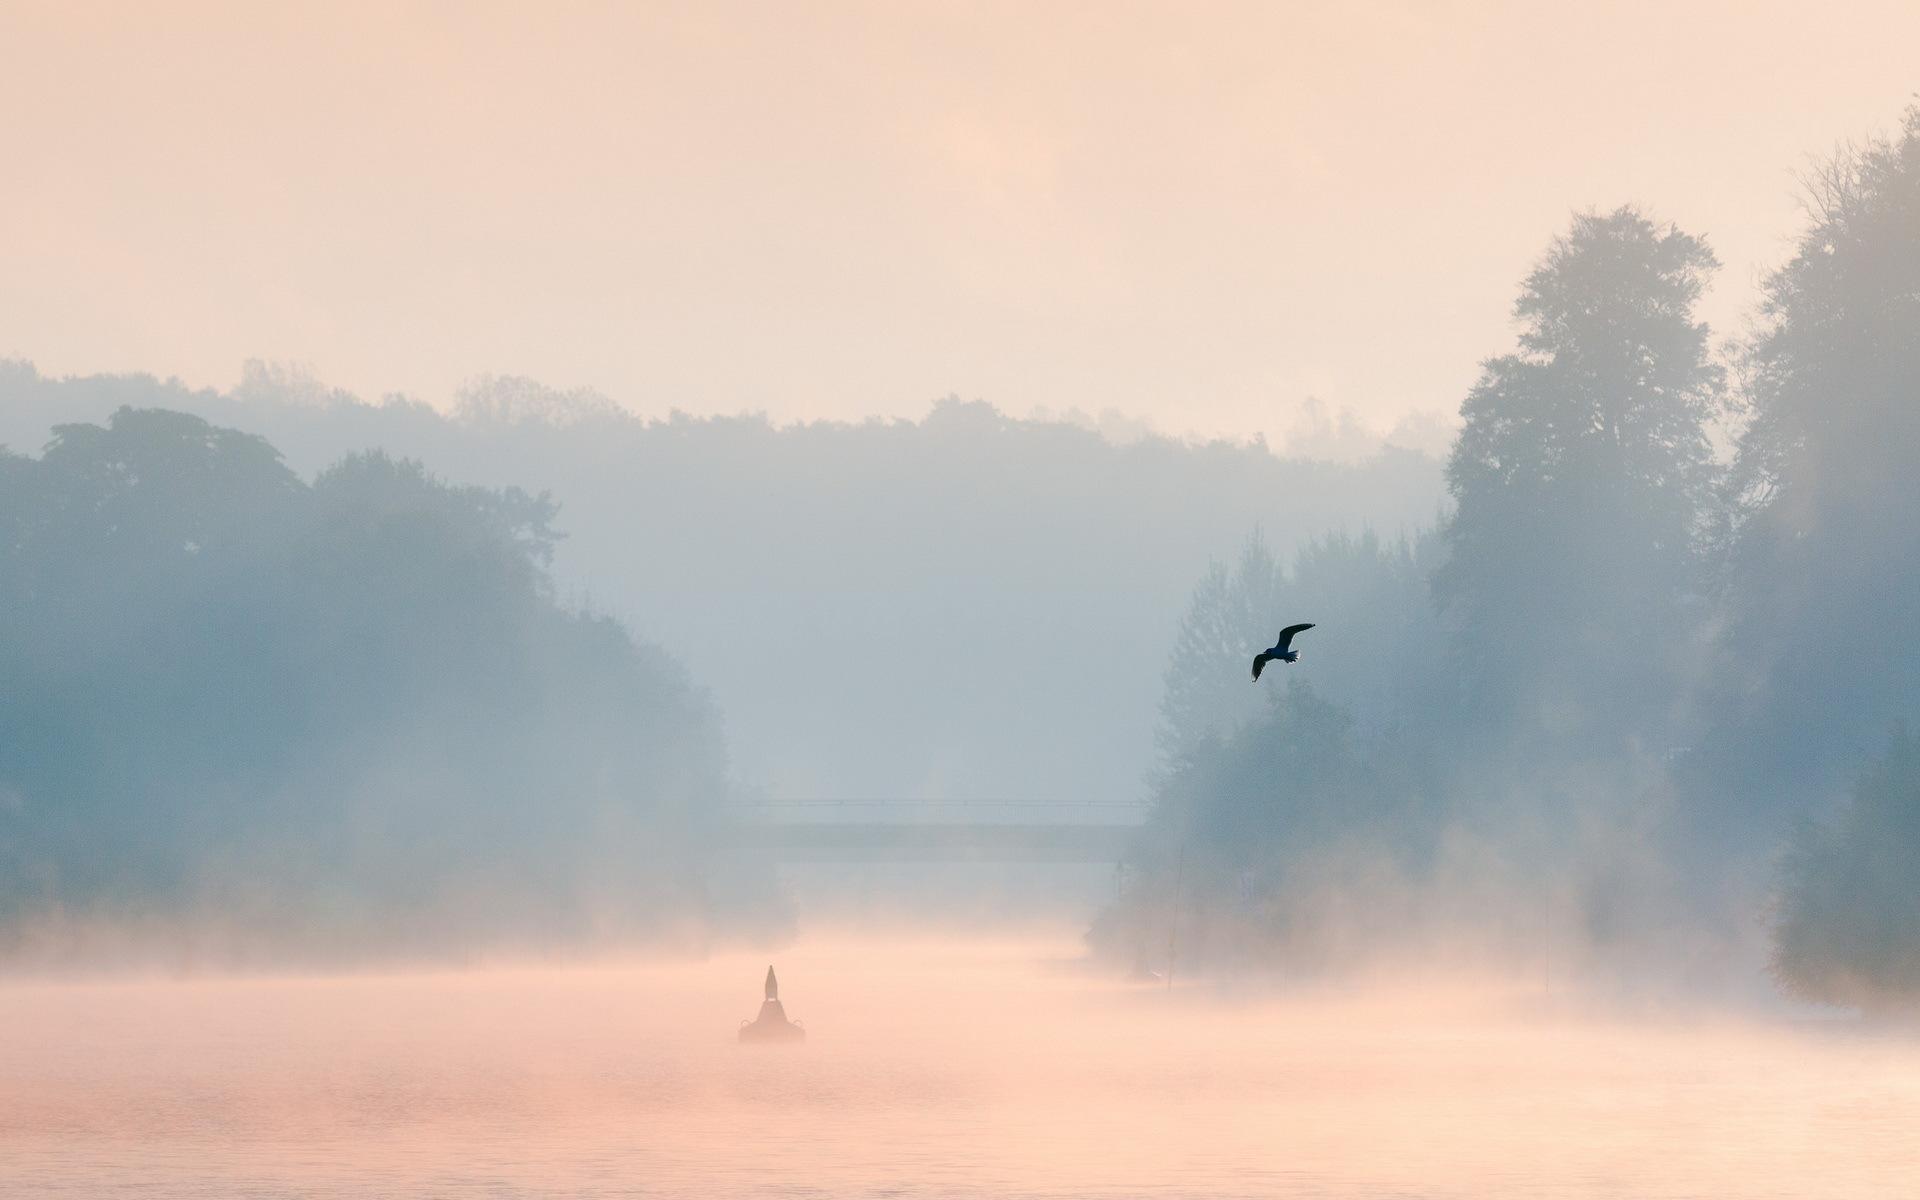 misty fog landscape wallpapers - photo #6